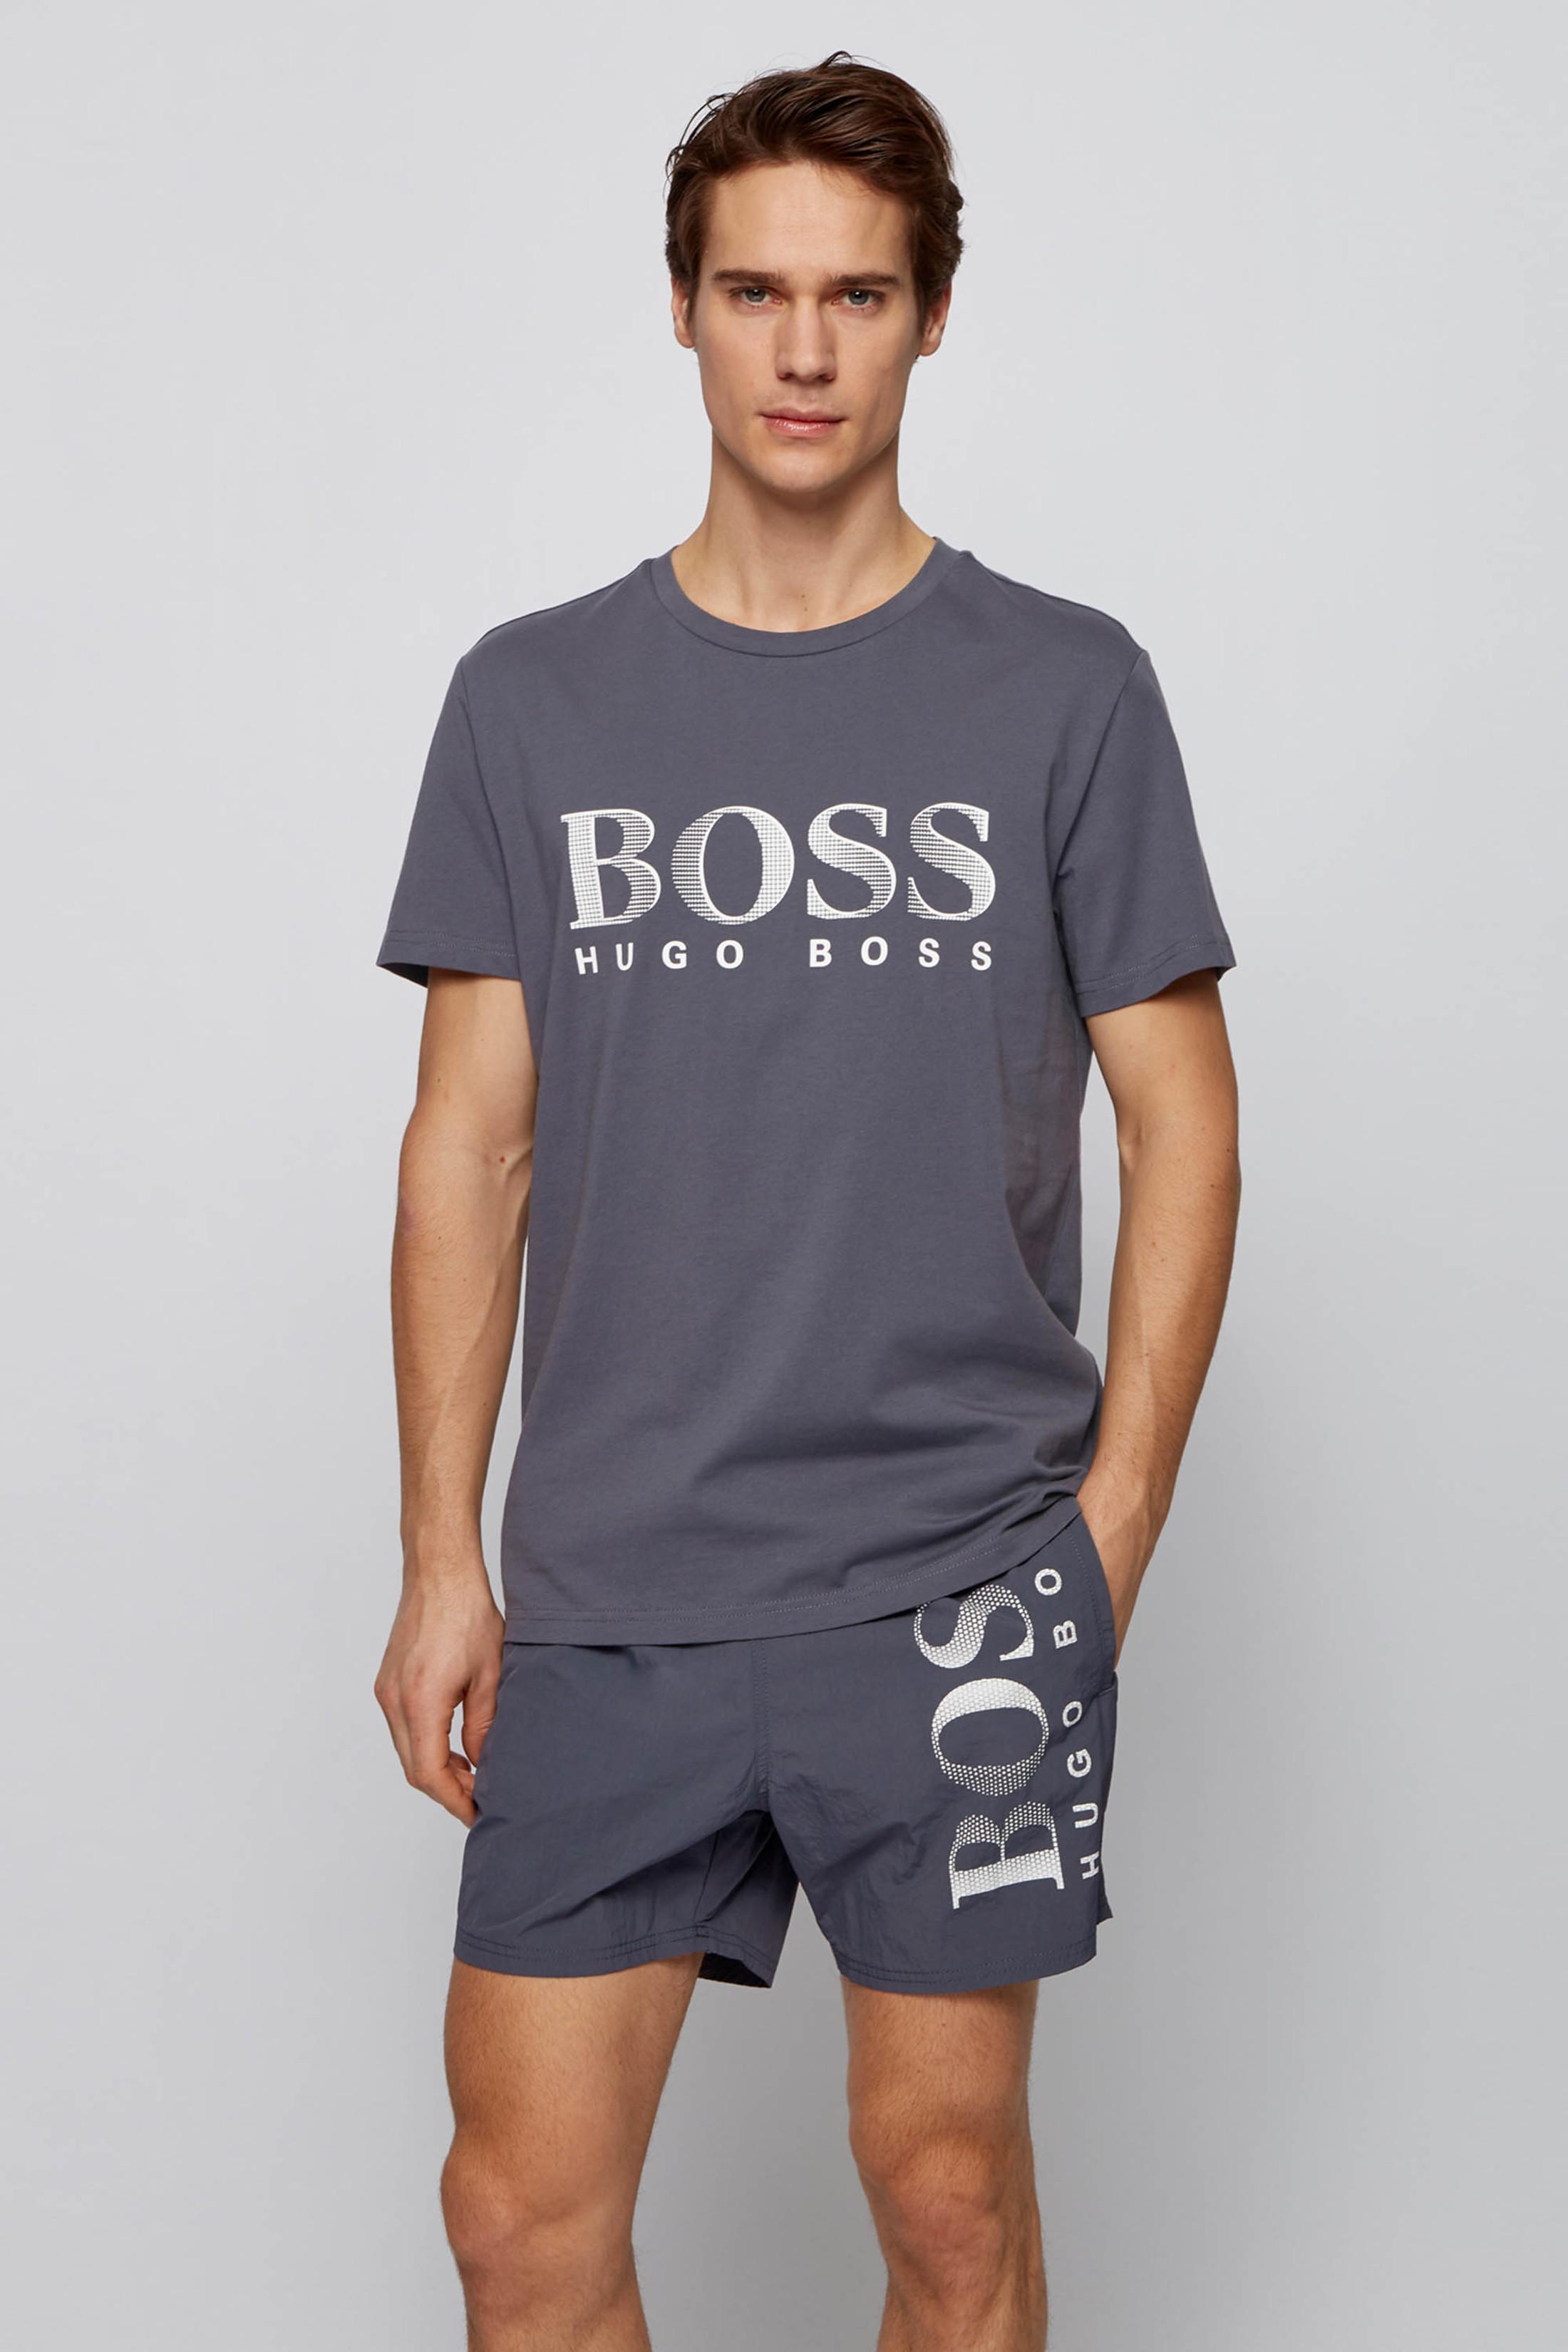 Hugo Boss T-shirt UV-Protection Donkergrijs